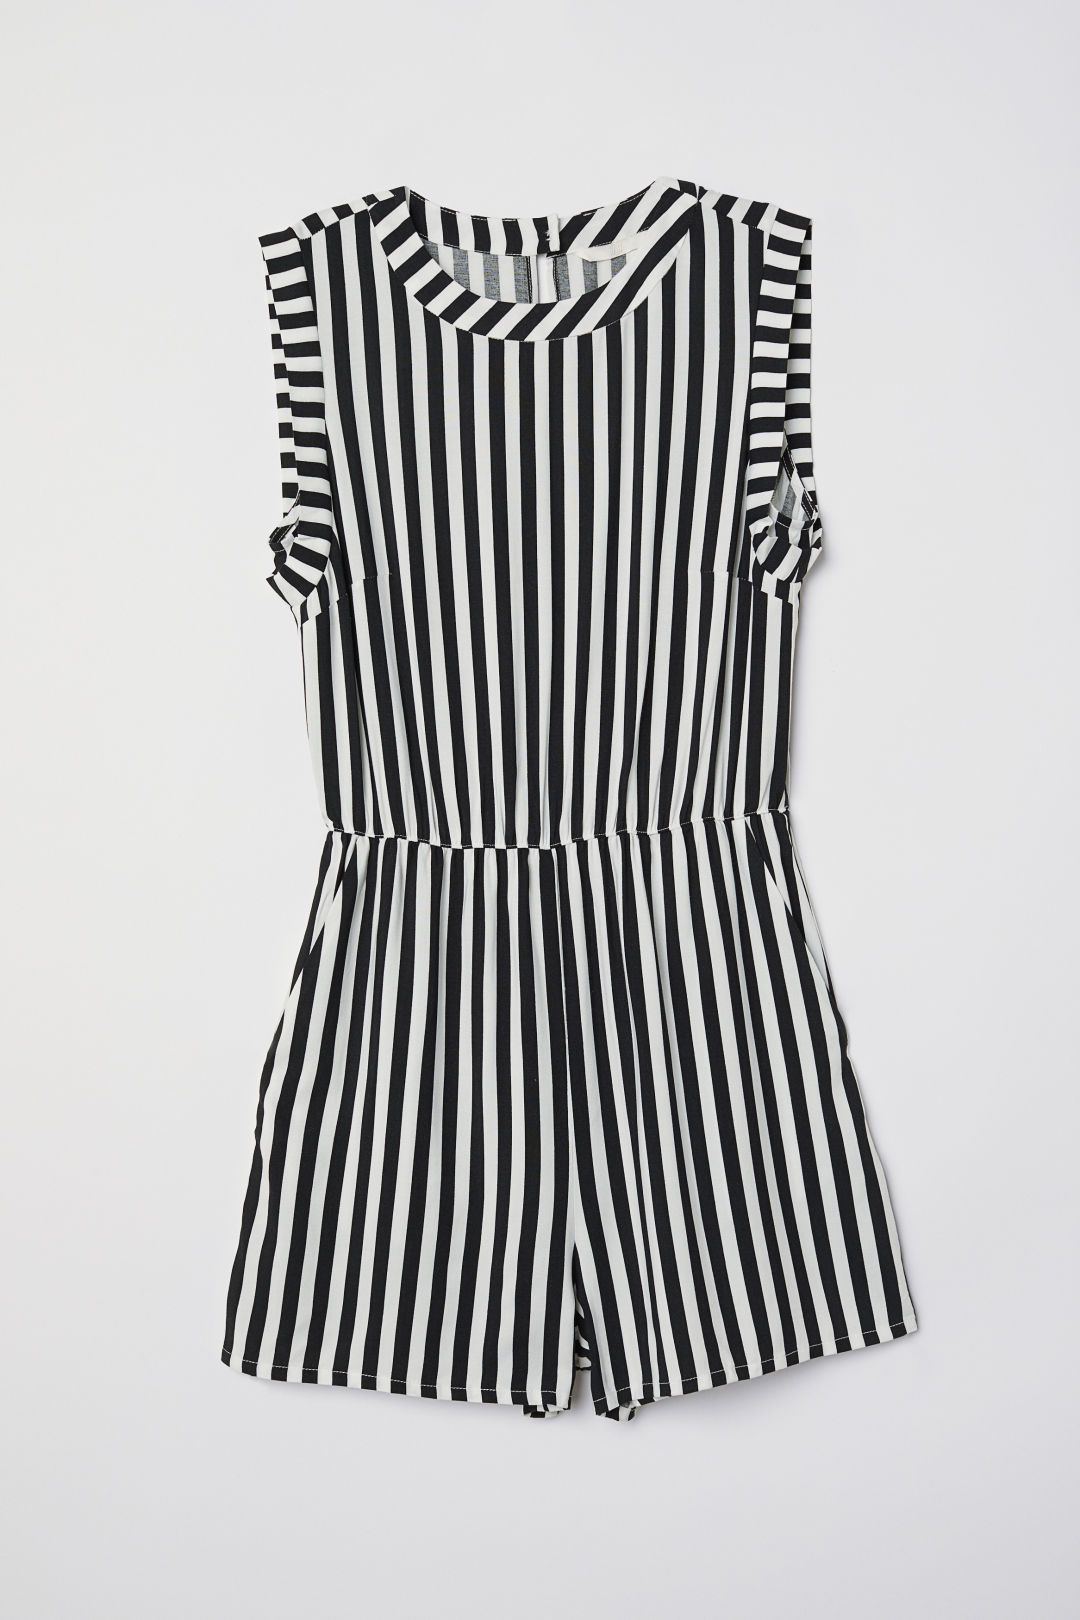 6d7b5b4b7cb0 Sleeveless Jumpsuit - White black striped -